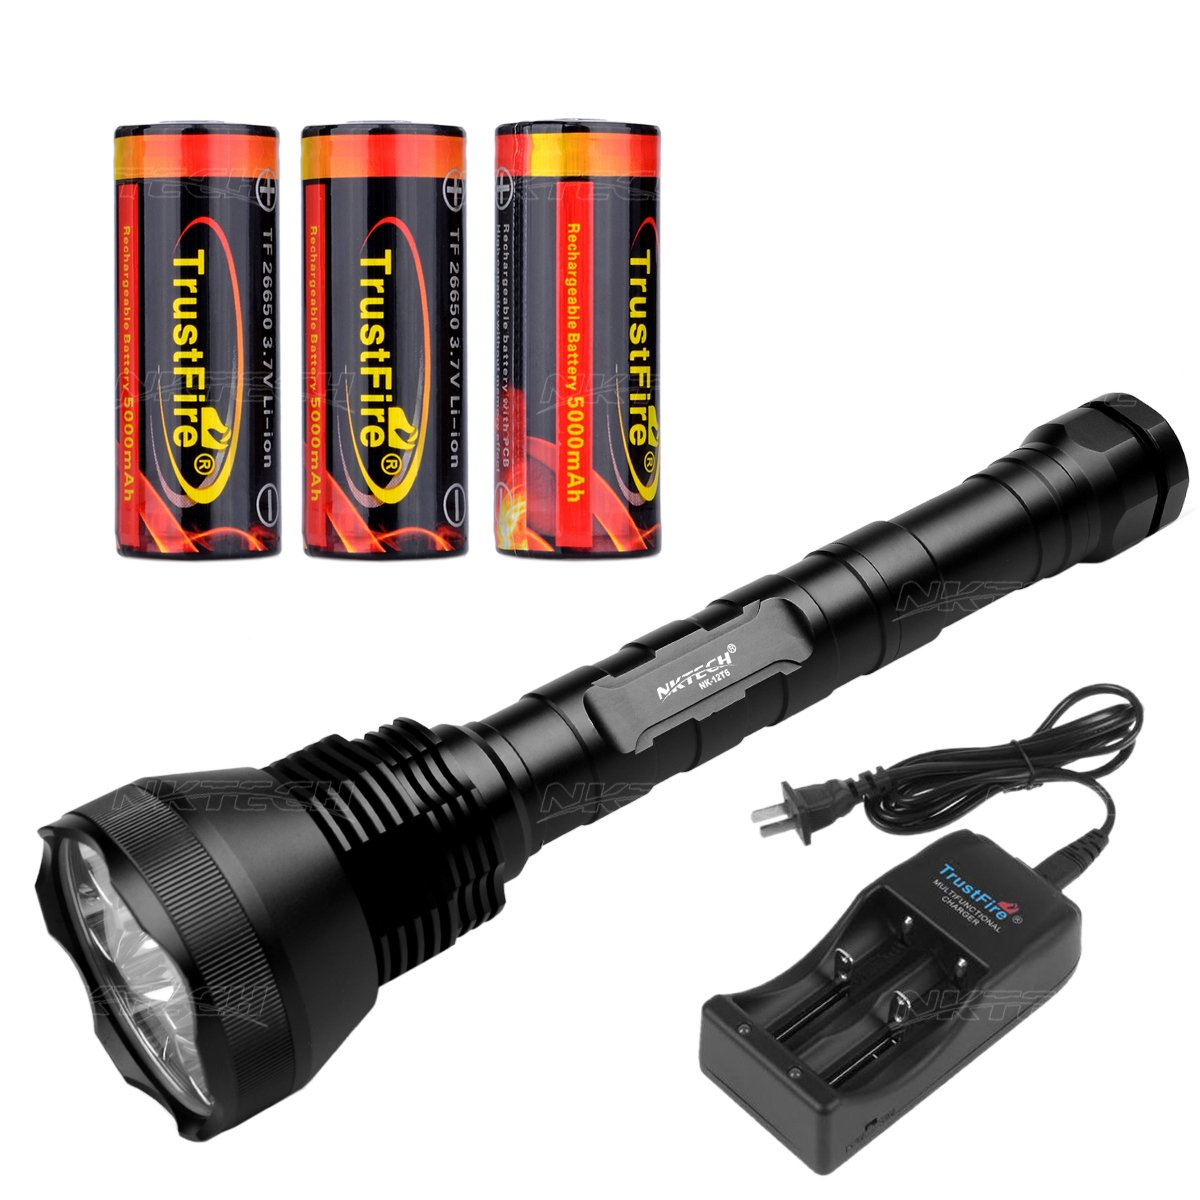 Nktech Outdoor Ultra Bright nk-12t6 12 x T6 LED 13800 Lumen Taschenlampe Lampe mit verlängerter Tube und 3 x Trustfire 26650 5000 mAh Akku mit pcb geschützt Board + tr-006 Dual Slot Ladegerät